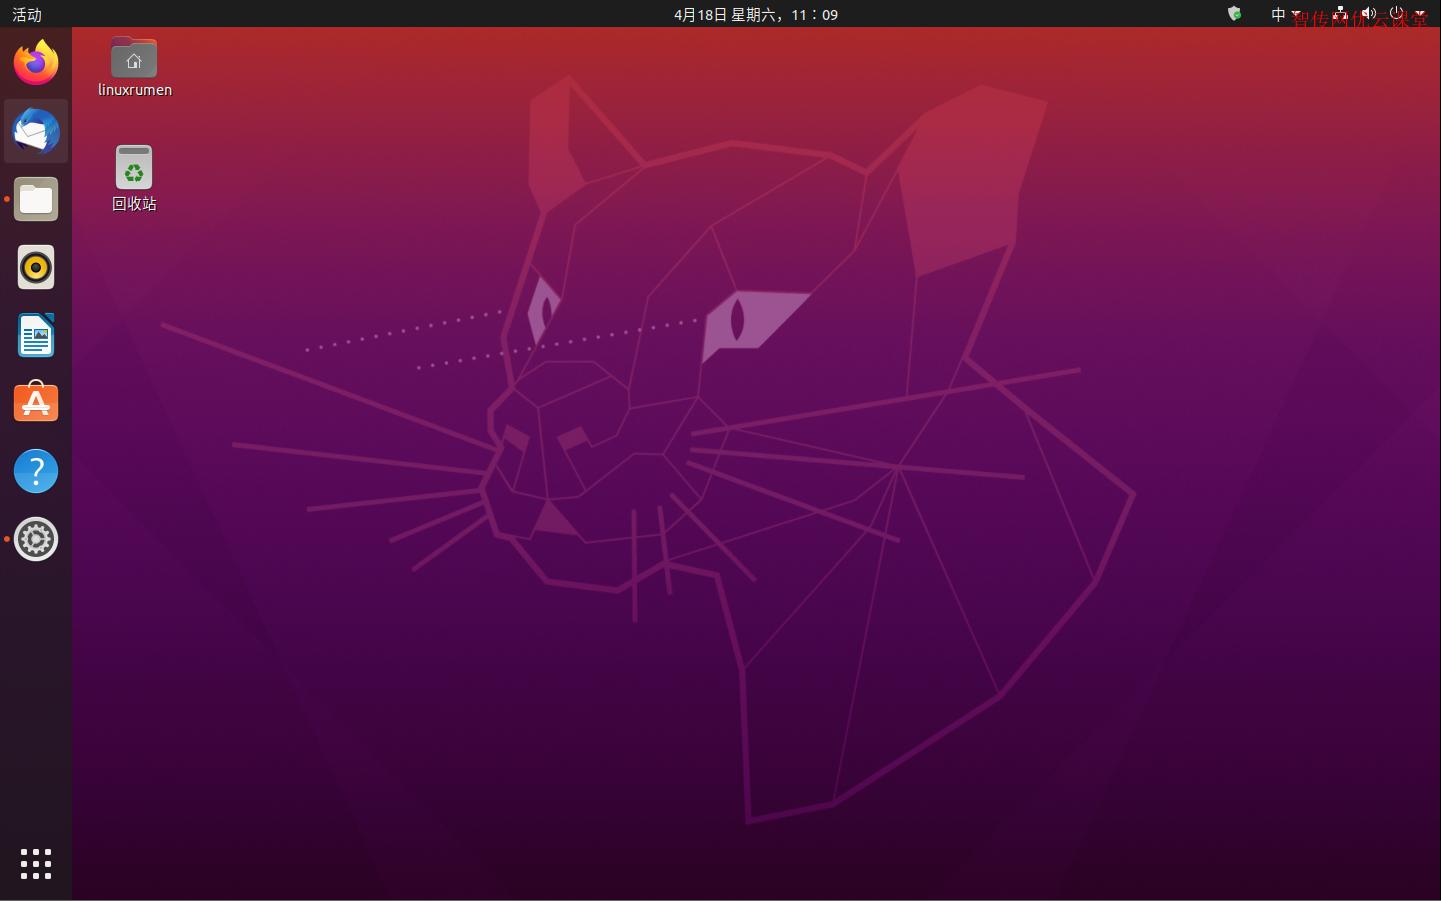 Ubuntu 20.04新的默认壁纸